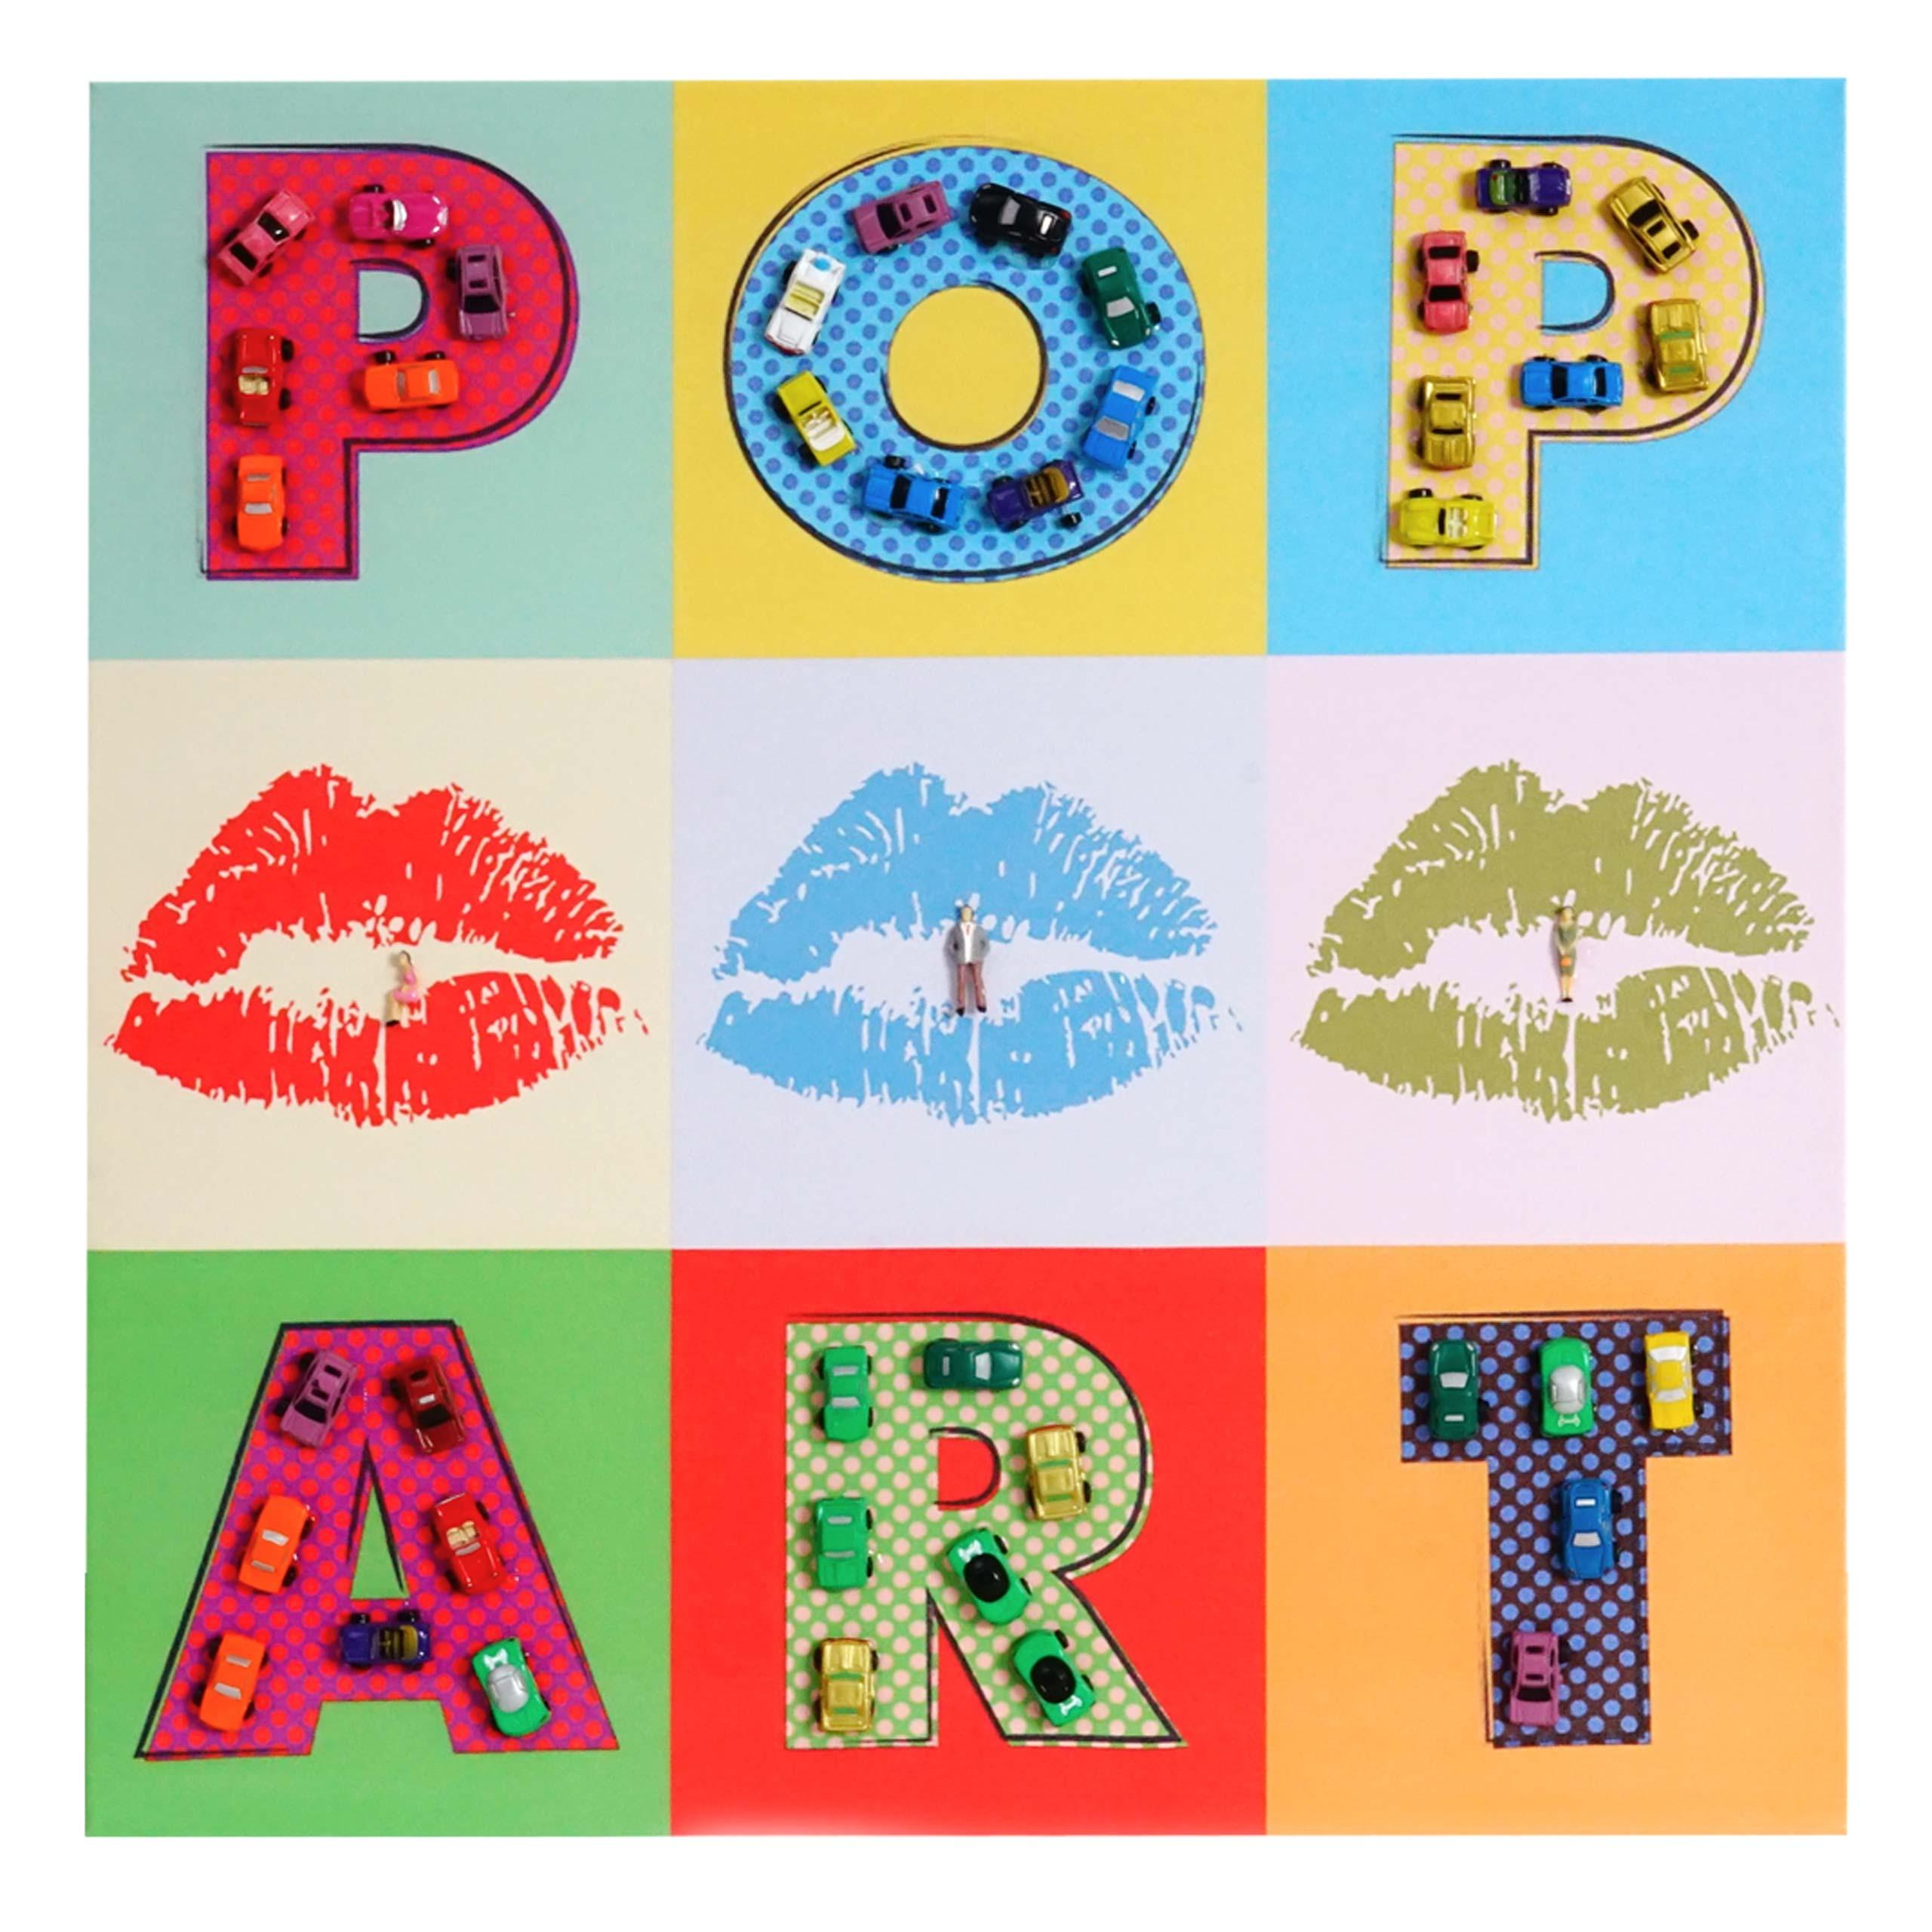 Cuadro pop art 60x60x3 cm pintado a mano al leo - Mobiliario pop art ...